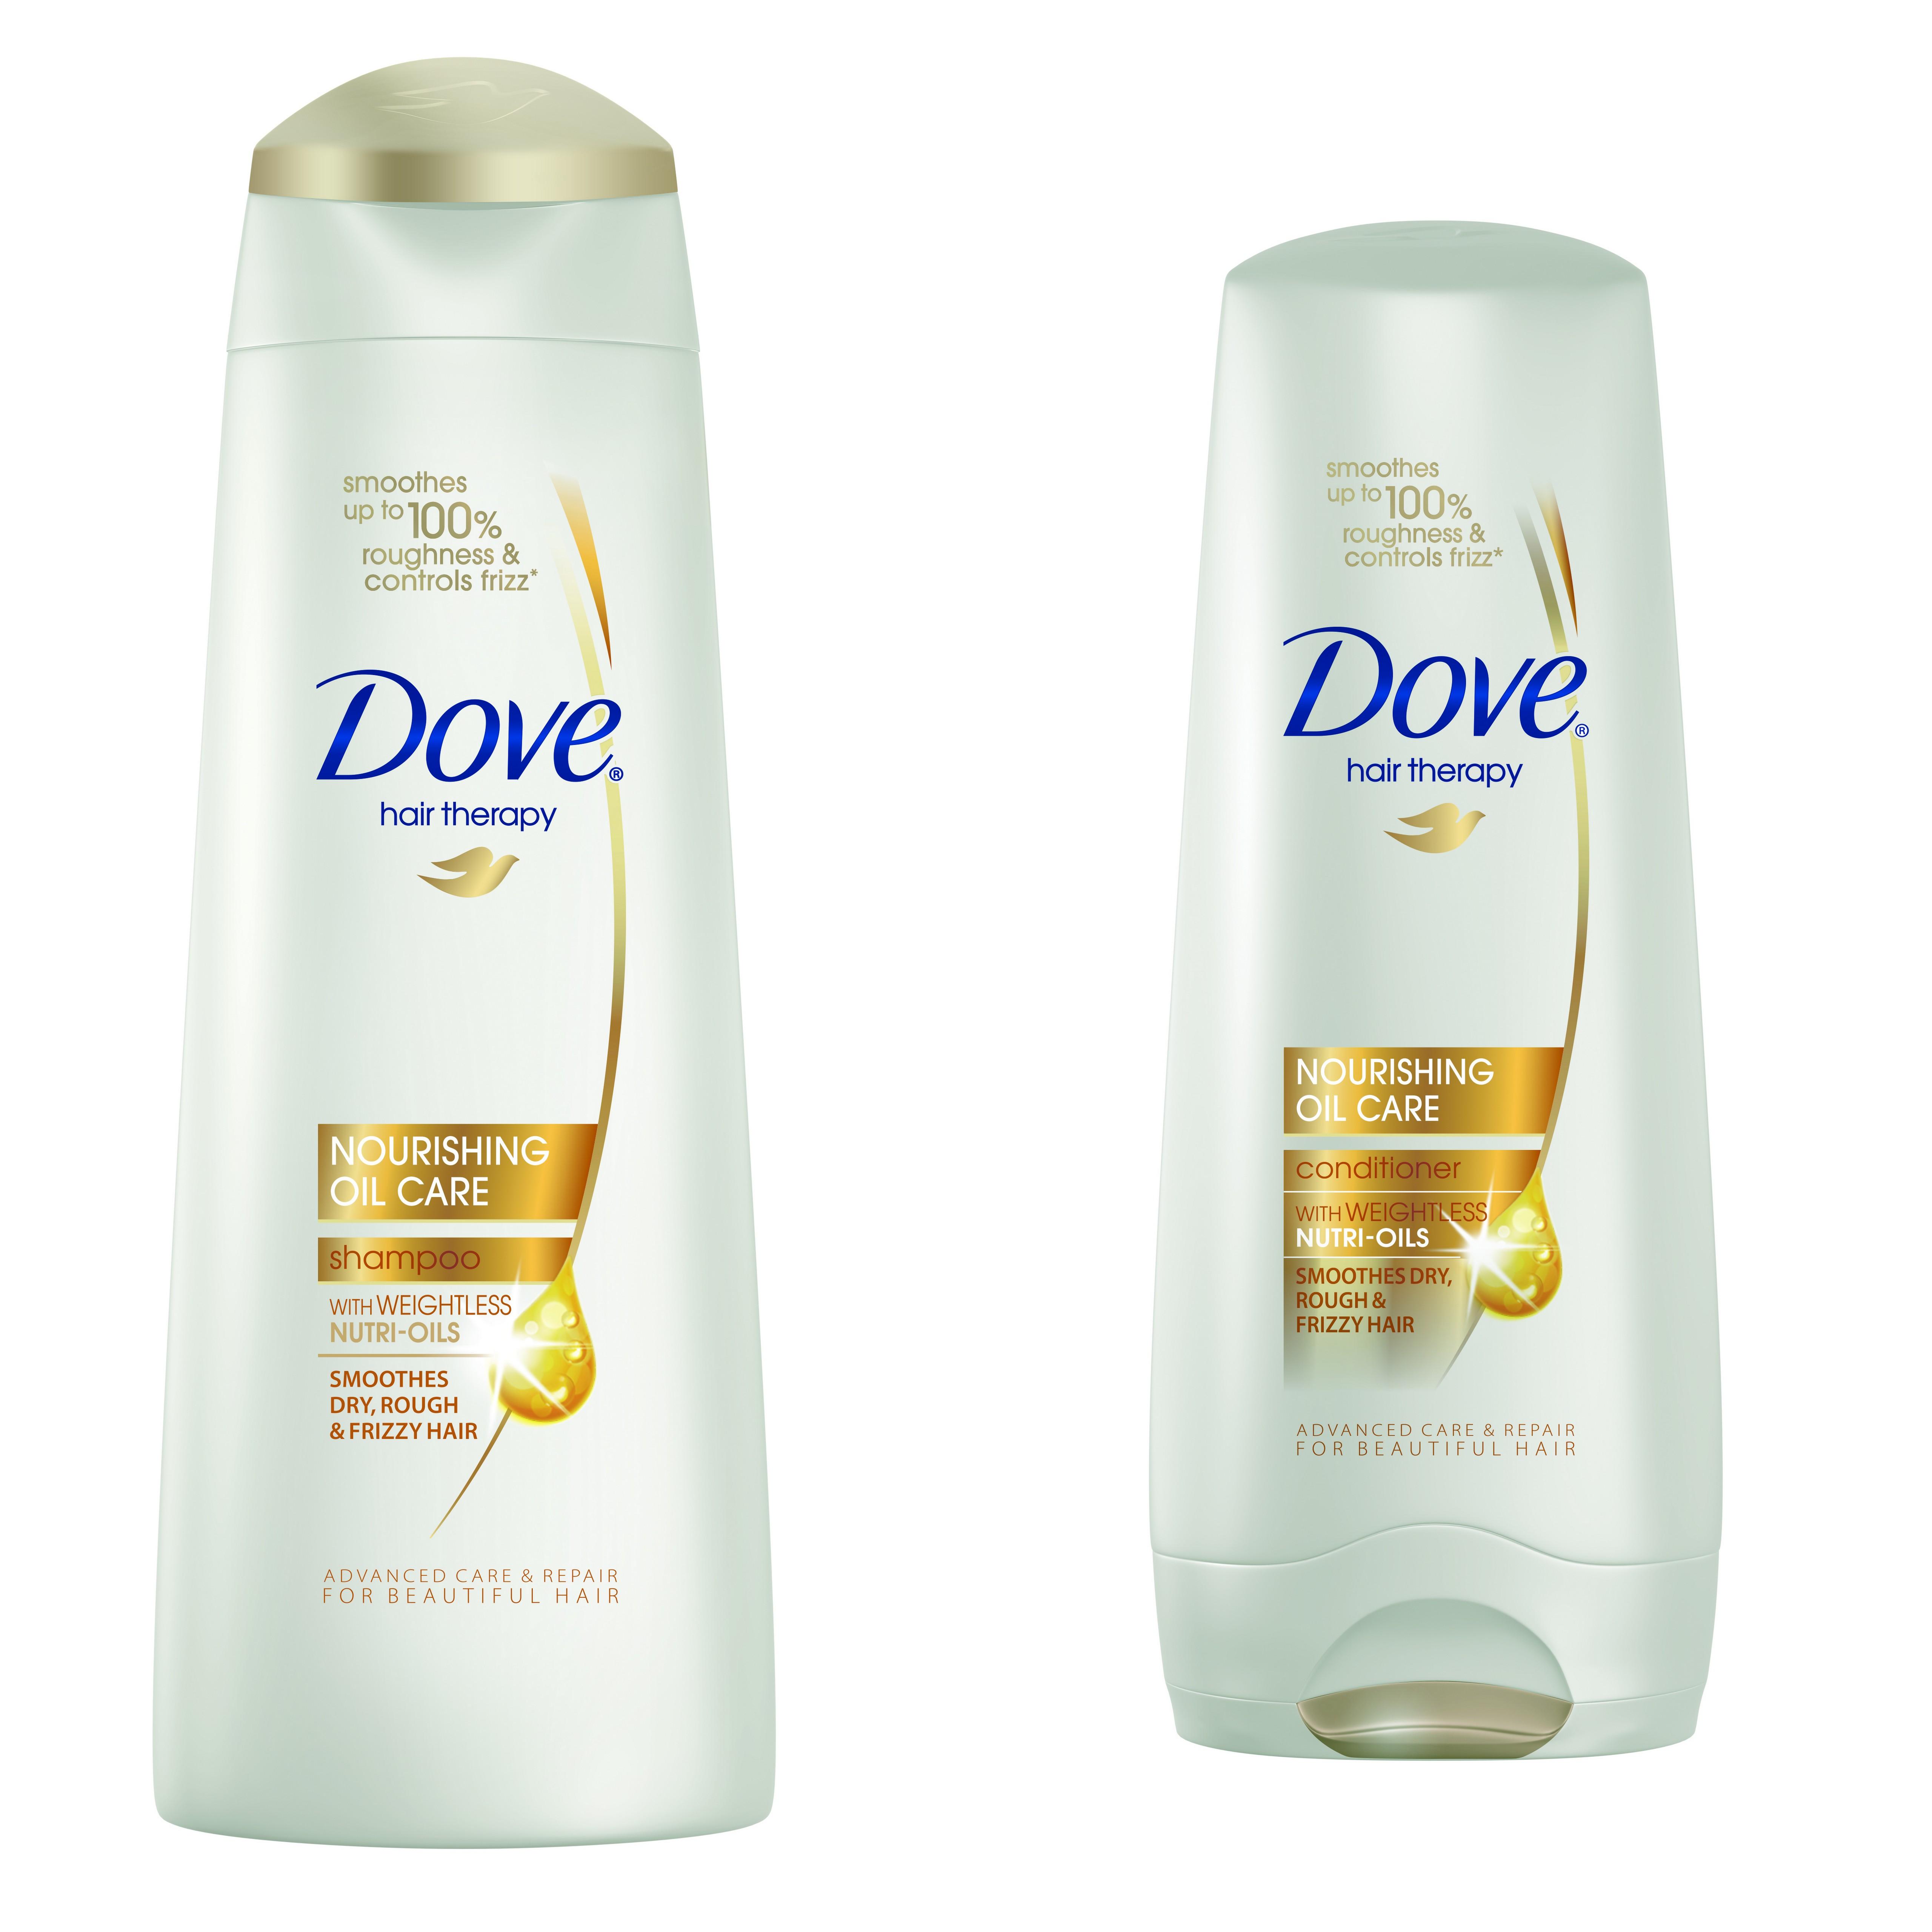 Dove Nourishing Oil Care Shampoo Conditioner And Daily